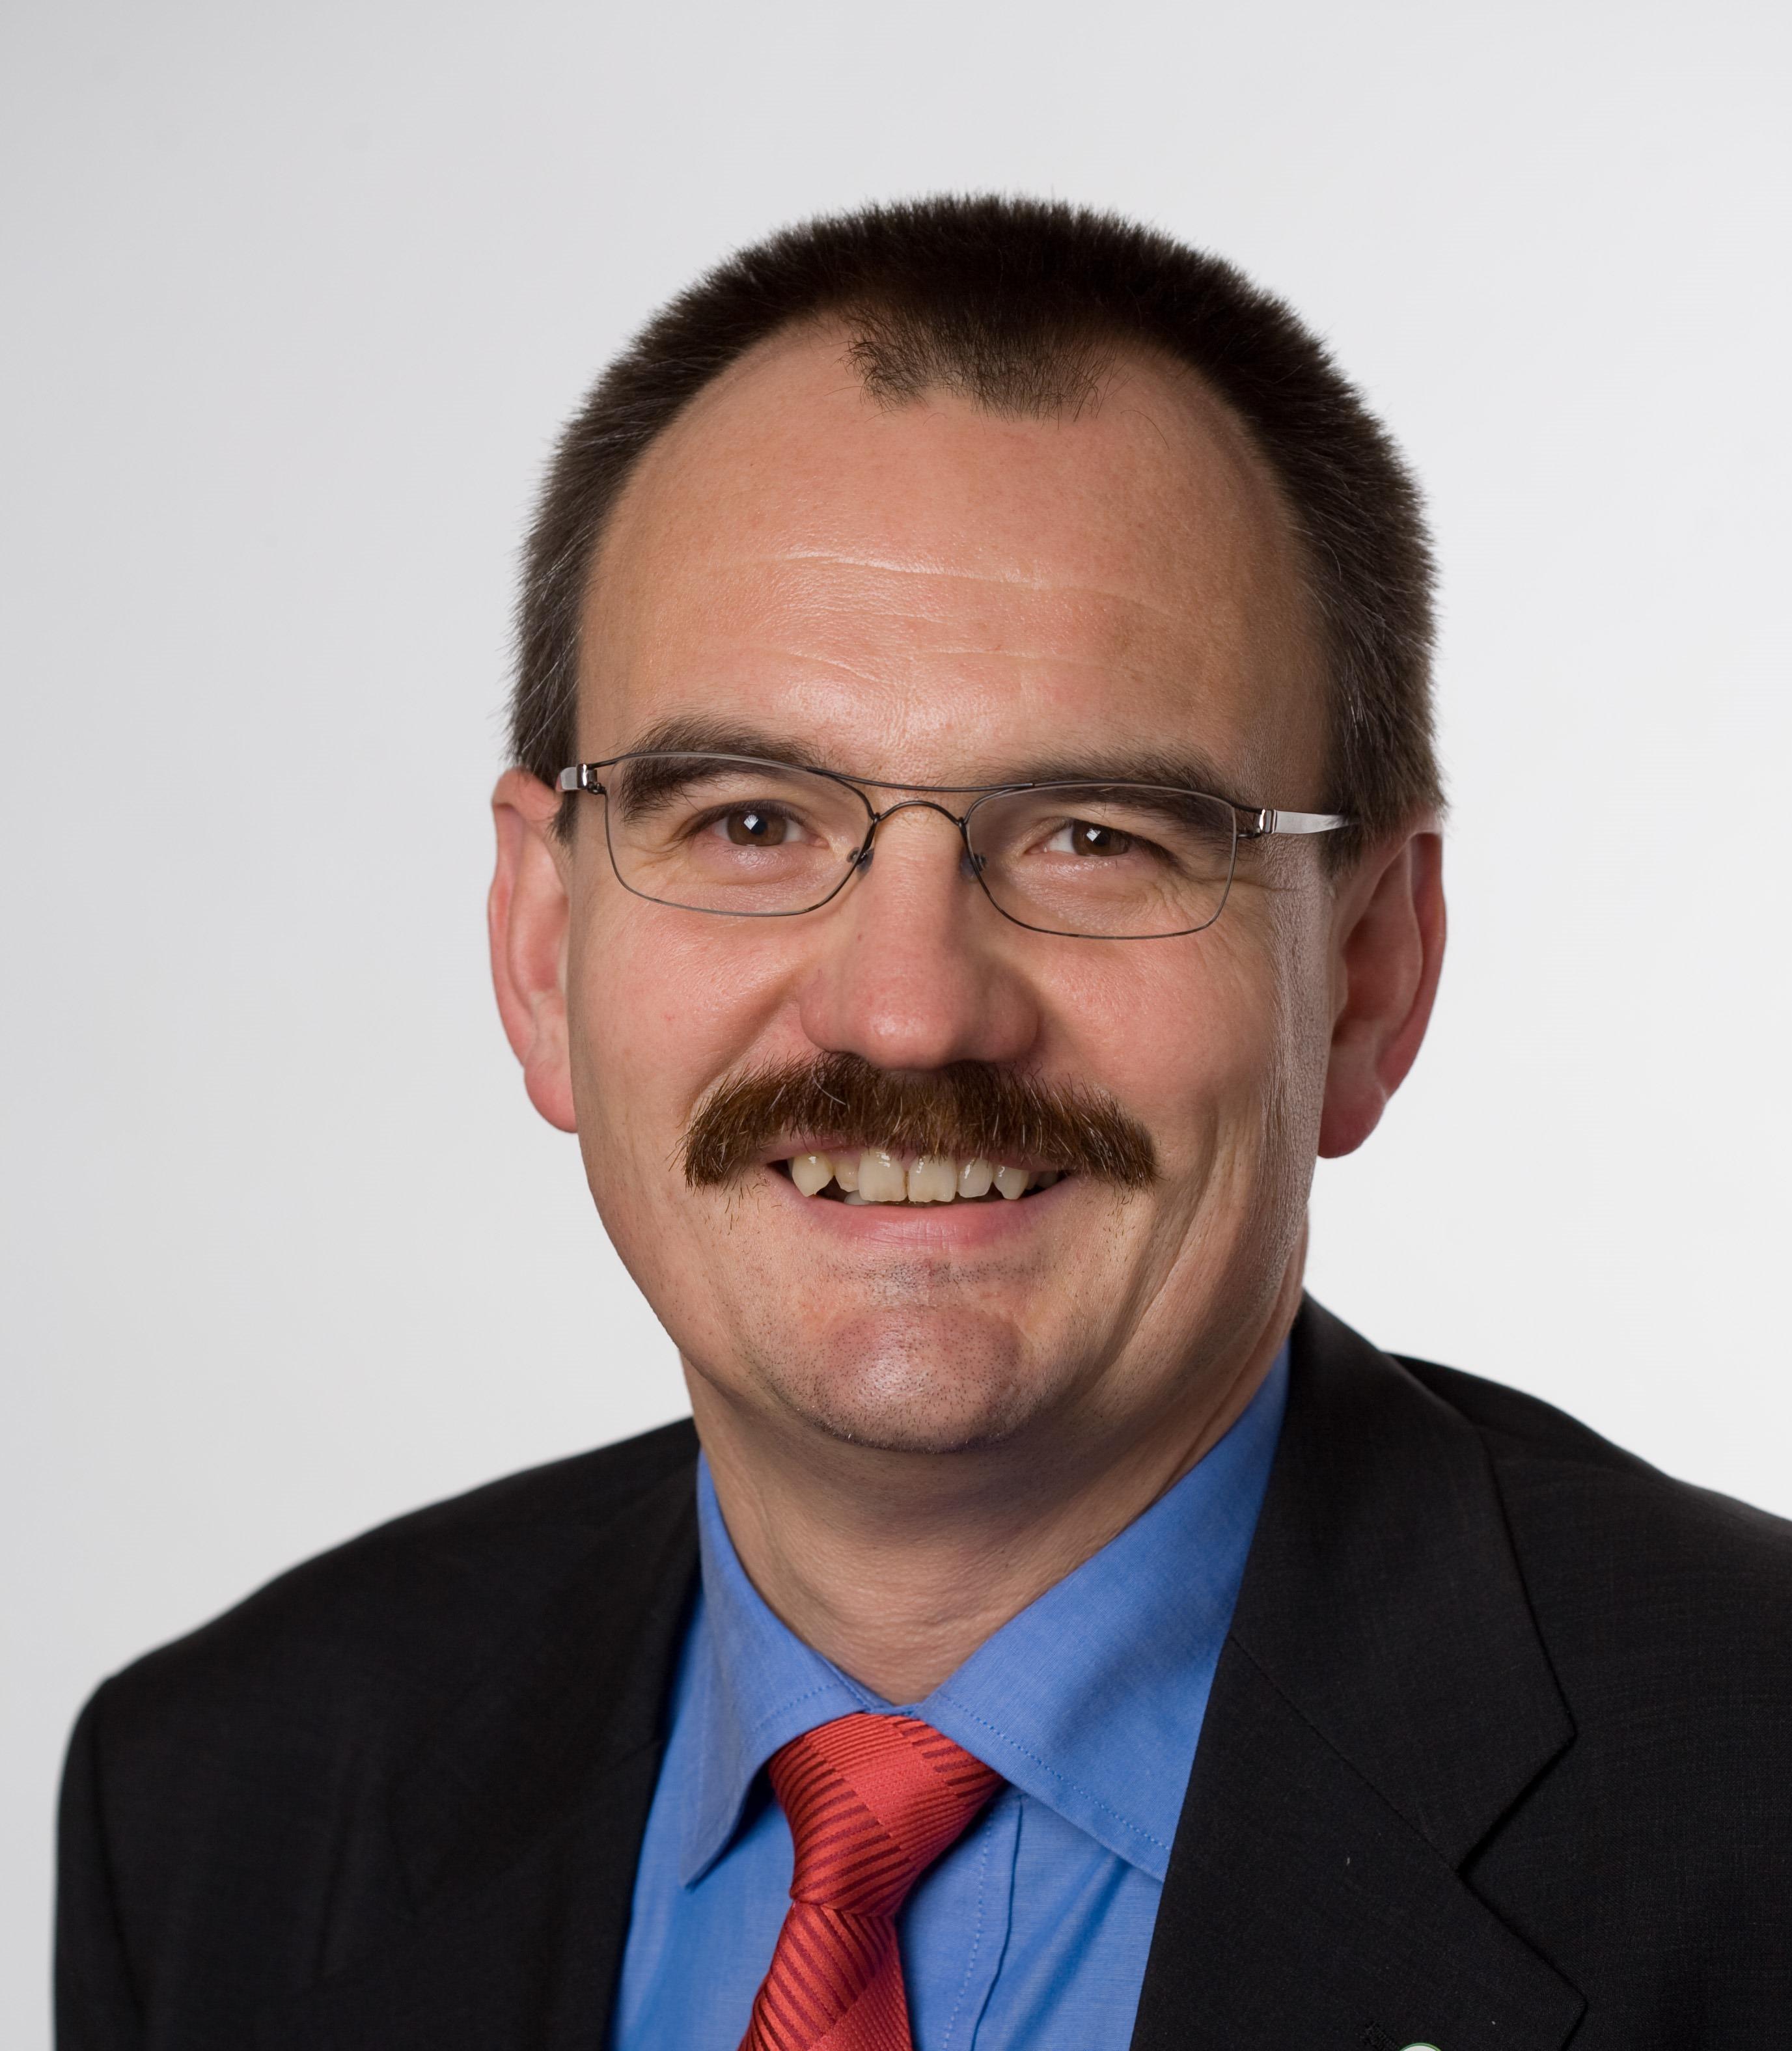 Peter Krüger picture